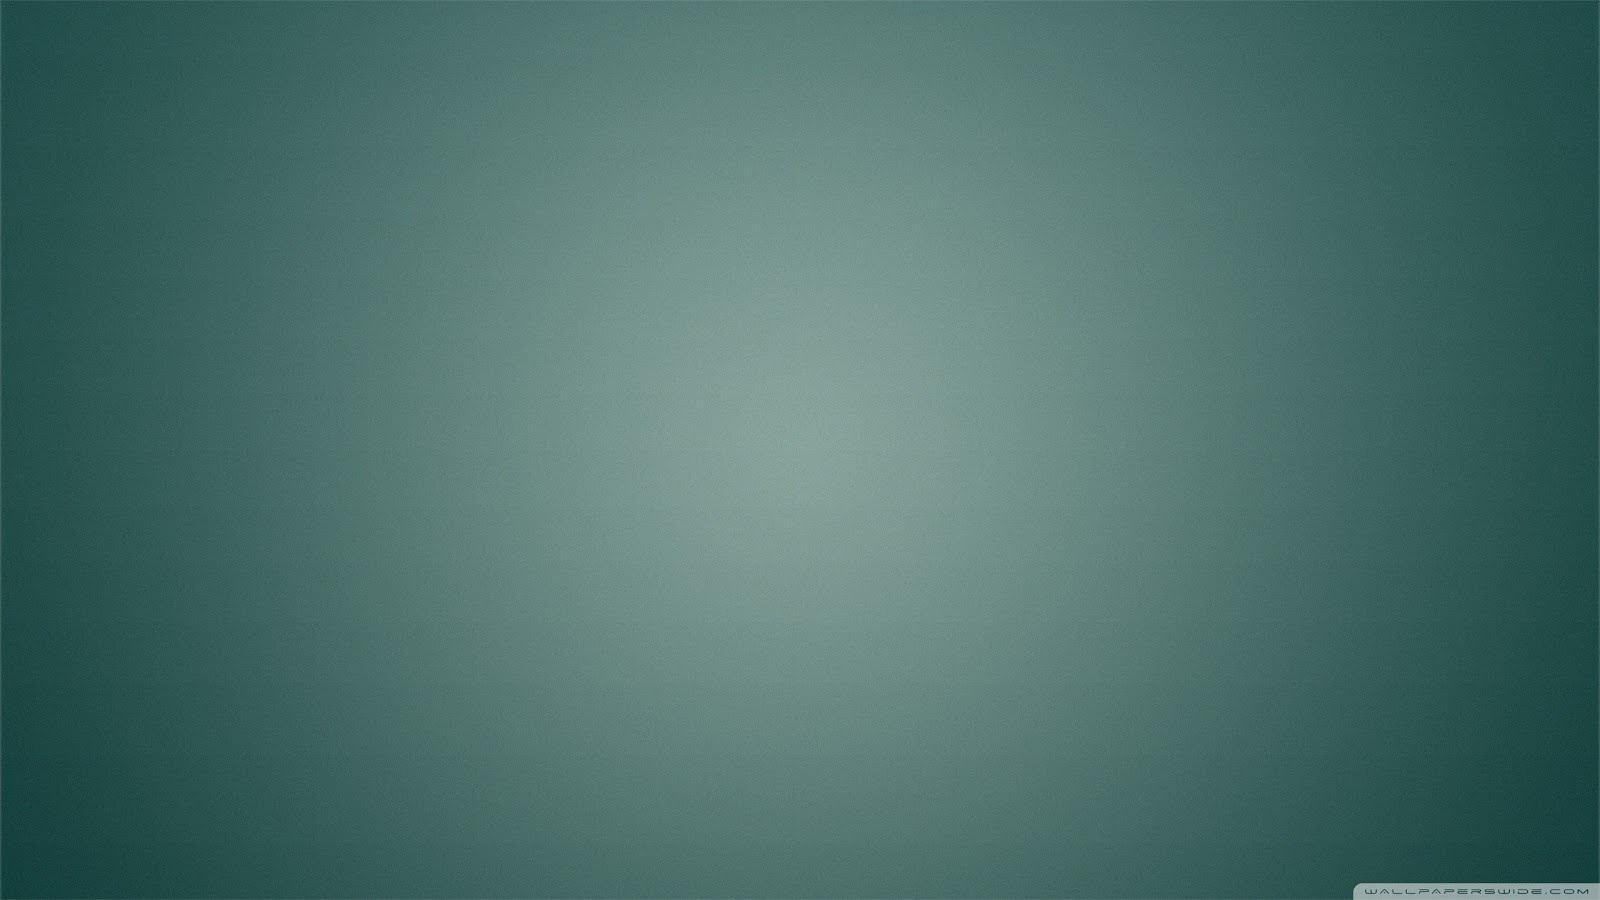 720 x 1280 phone wallpaper